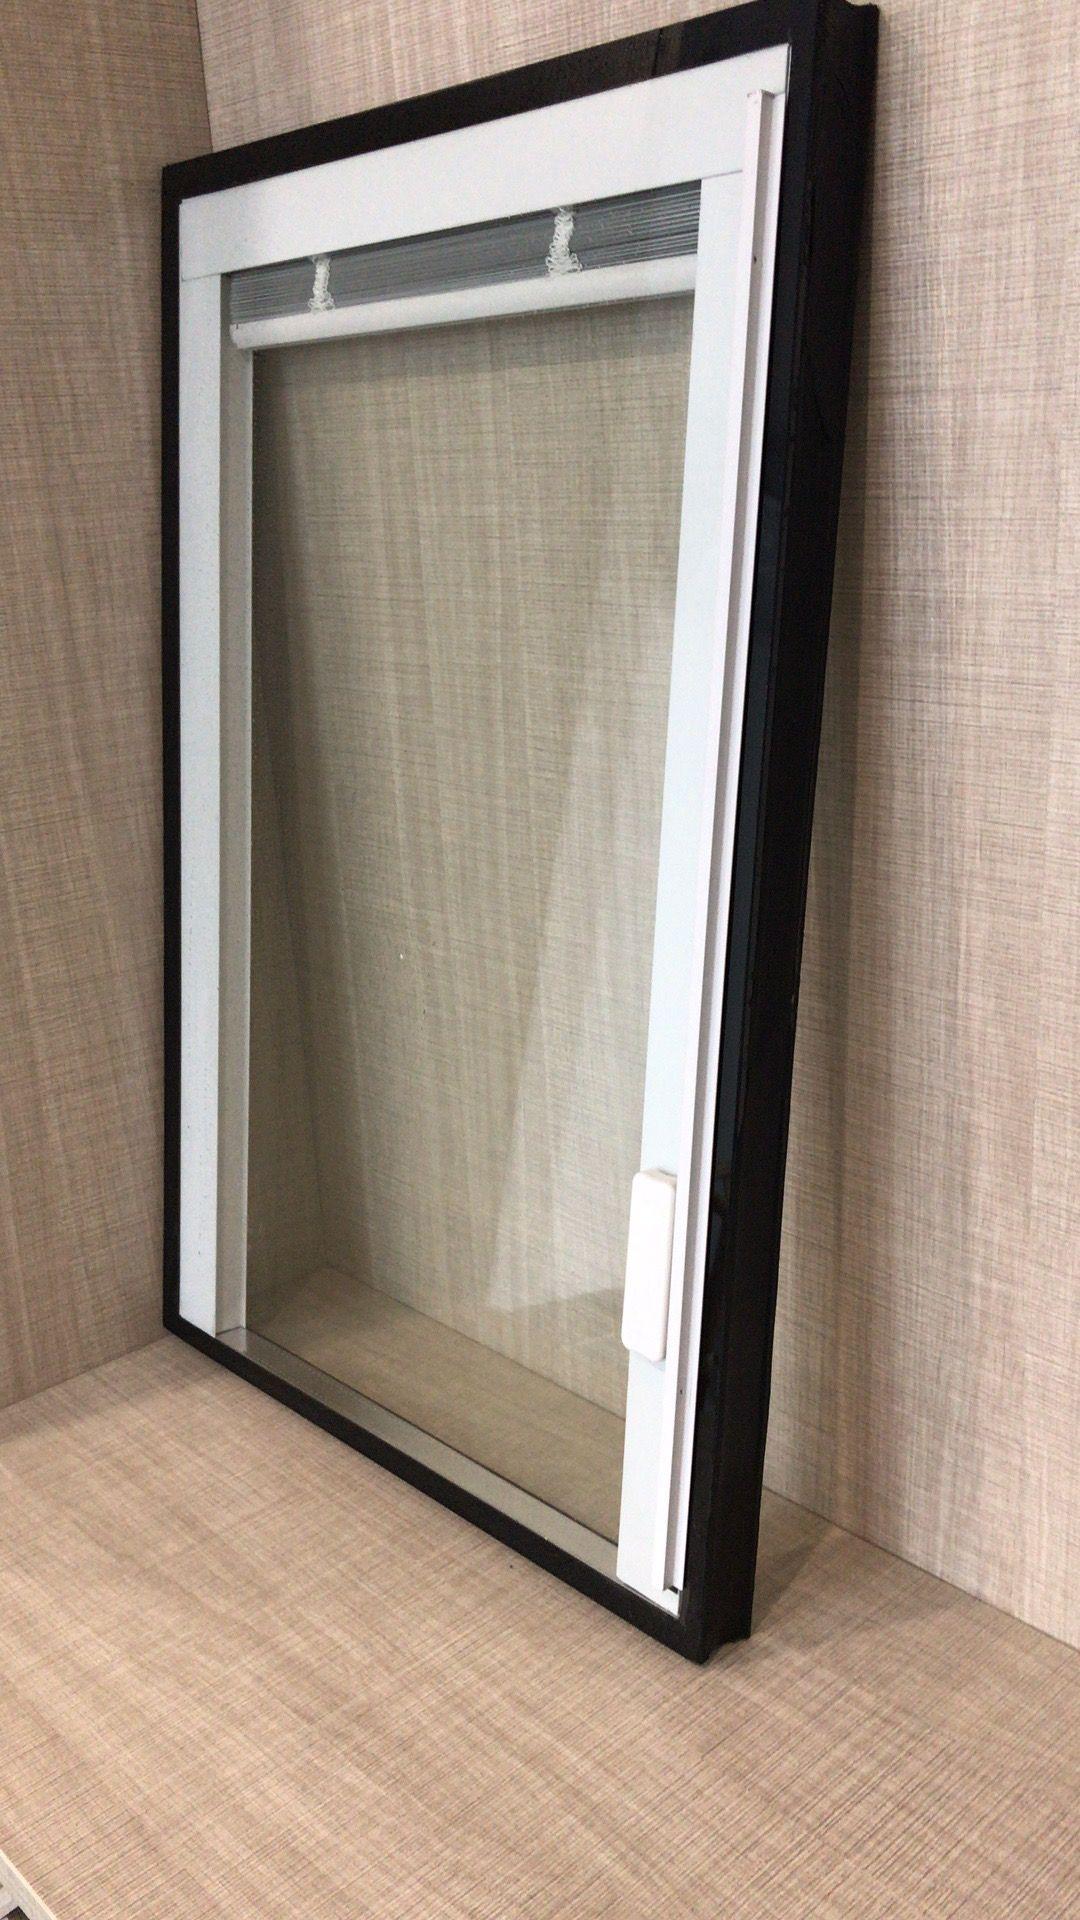 Double Glazing Built In Blind Window Glazing Double Glazing Aluminium Windows And Doors